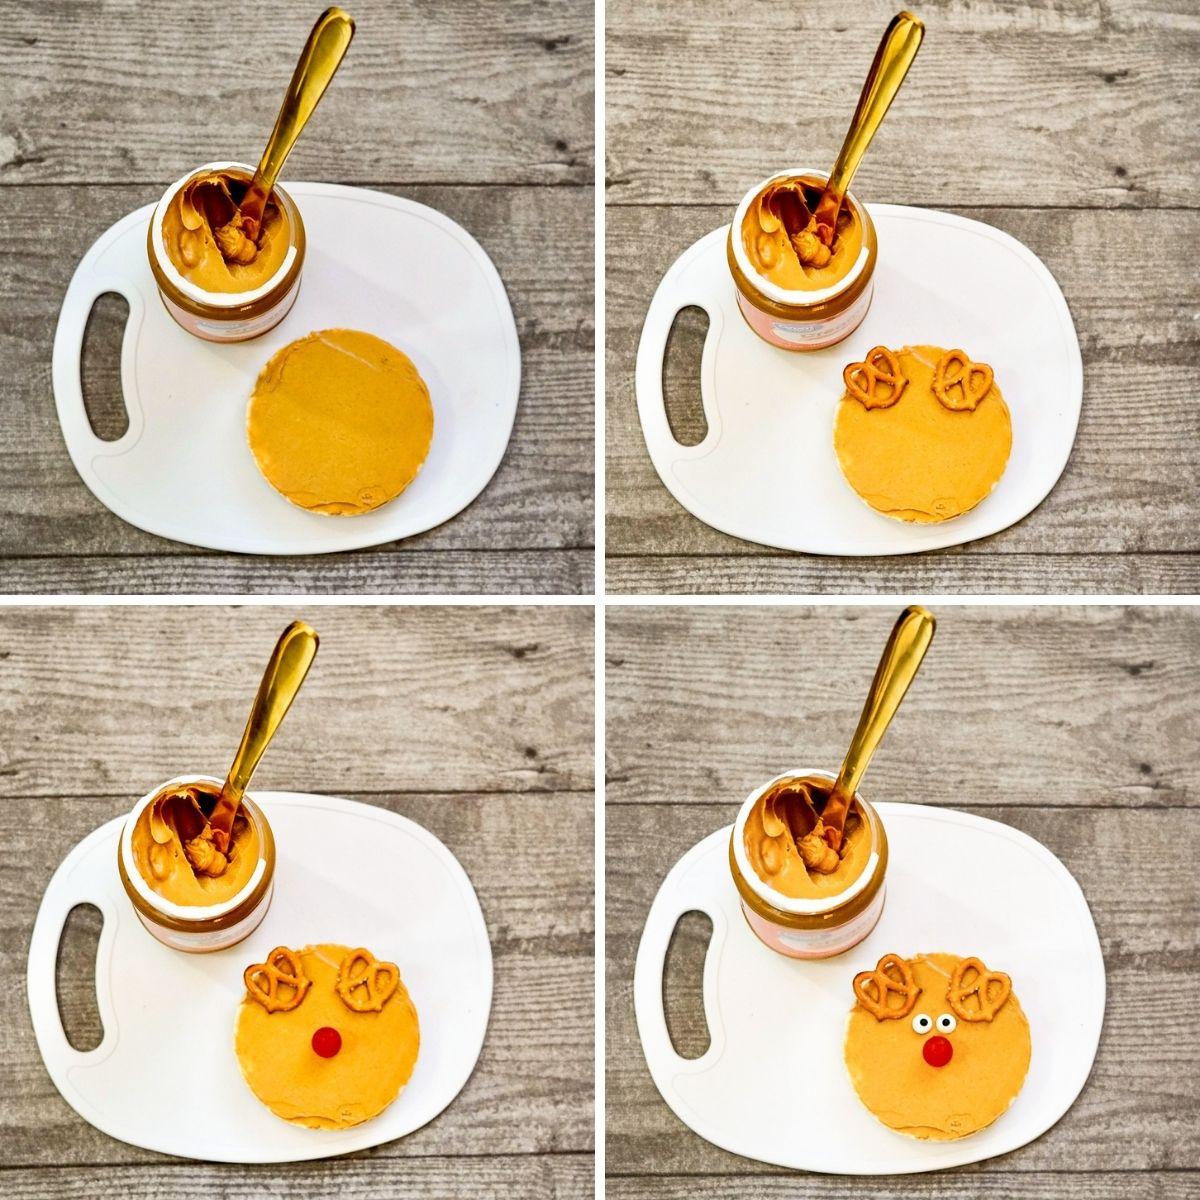 steps for how to make peanut butter rice cake snacks / Rudolph christmas snacks